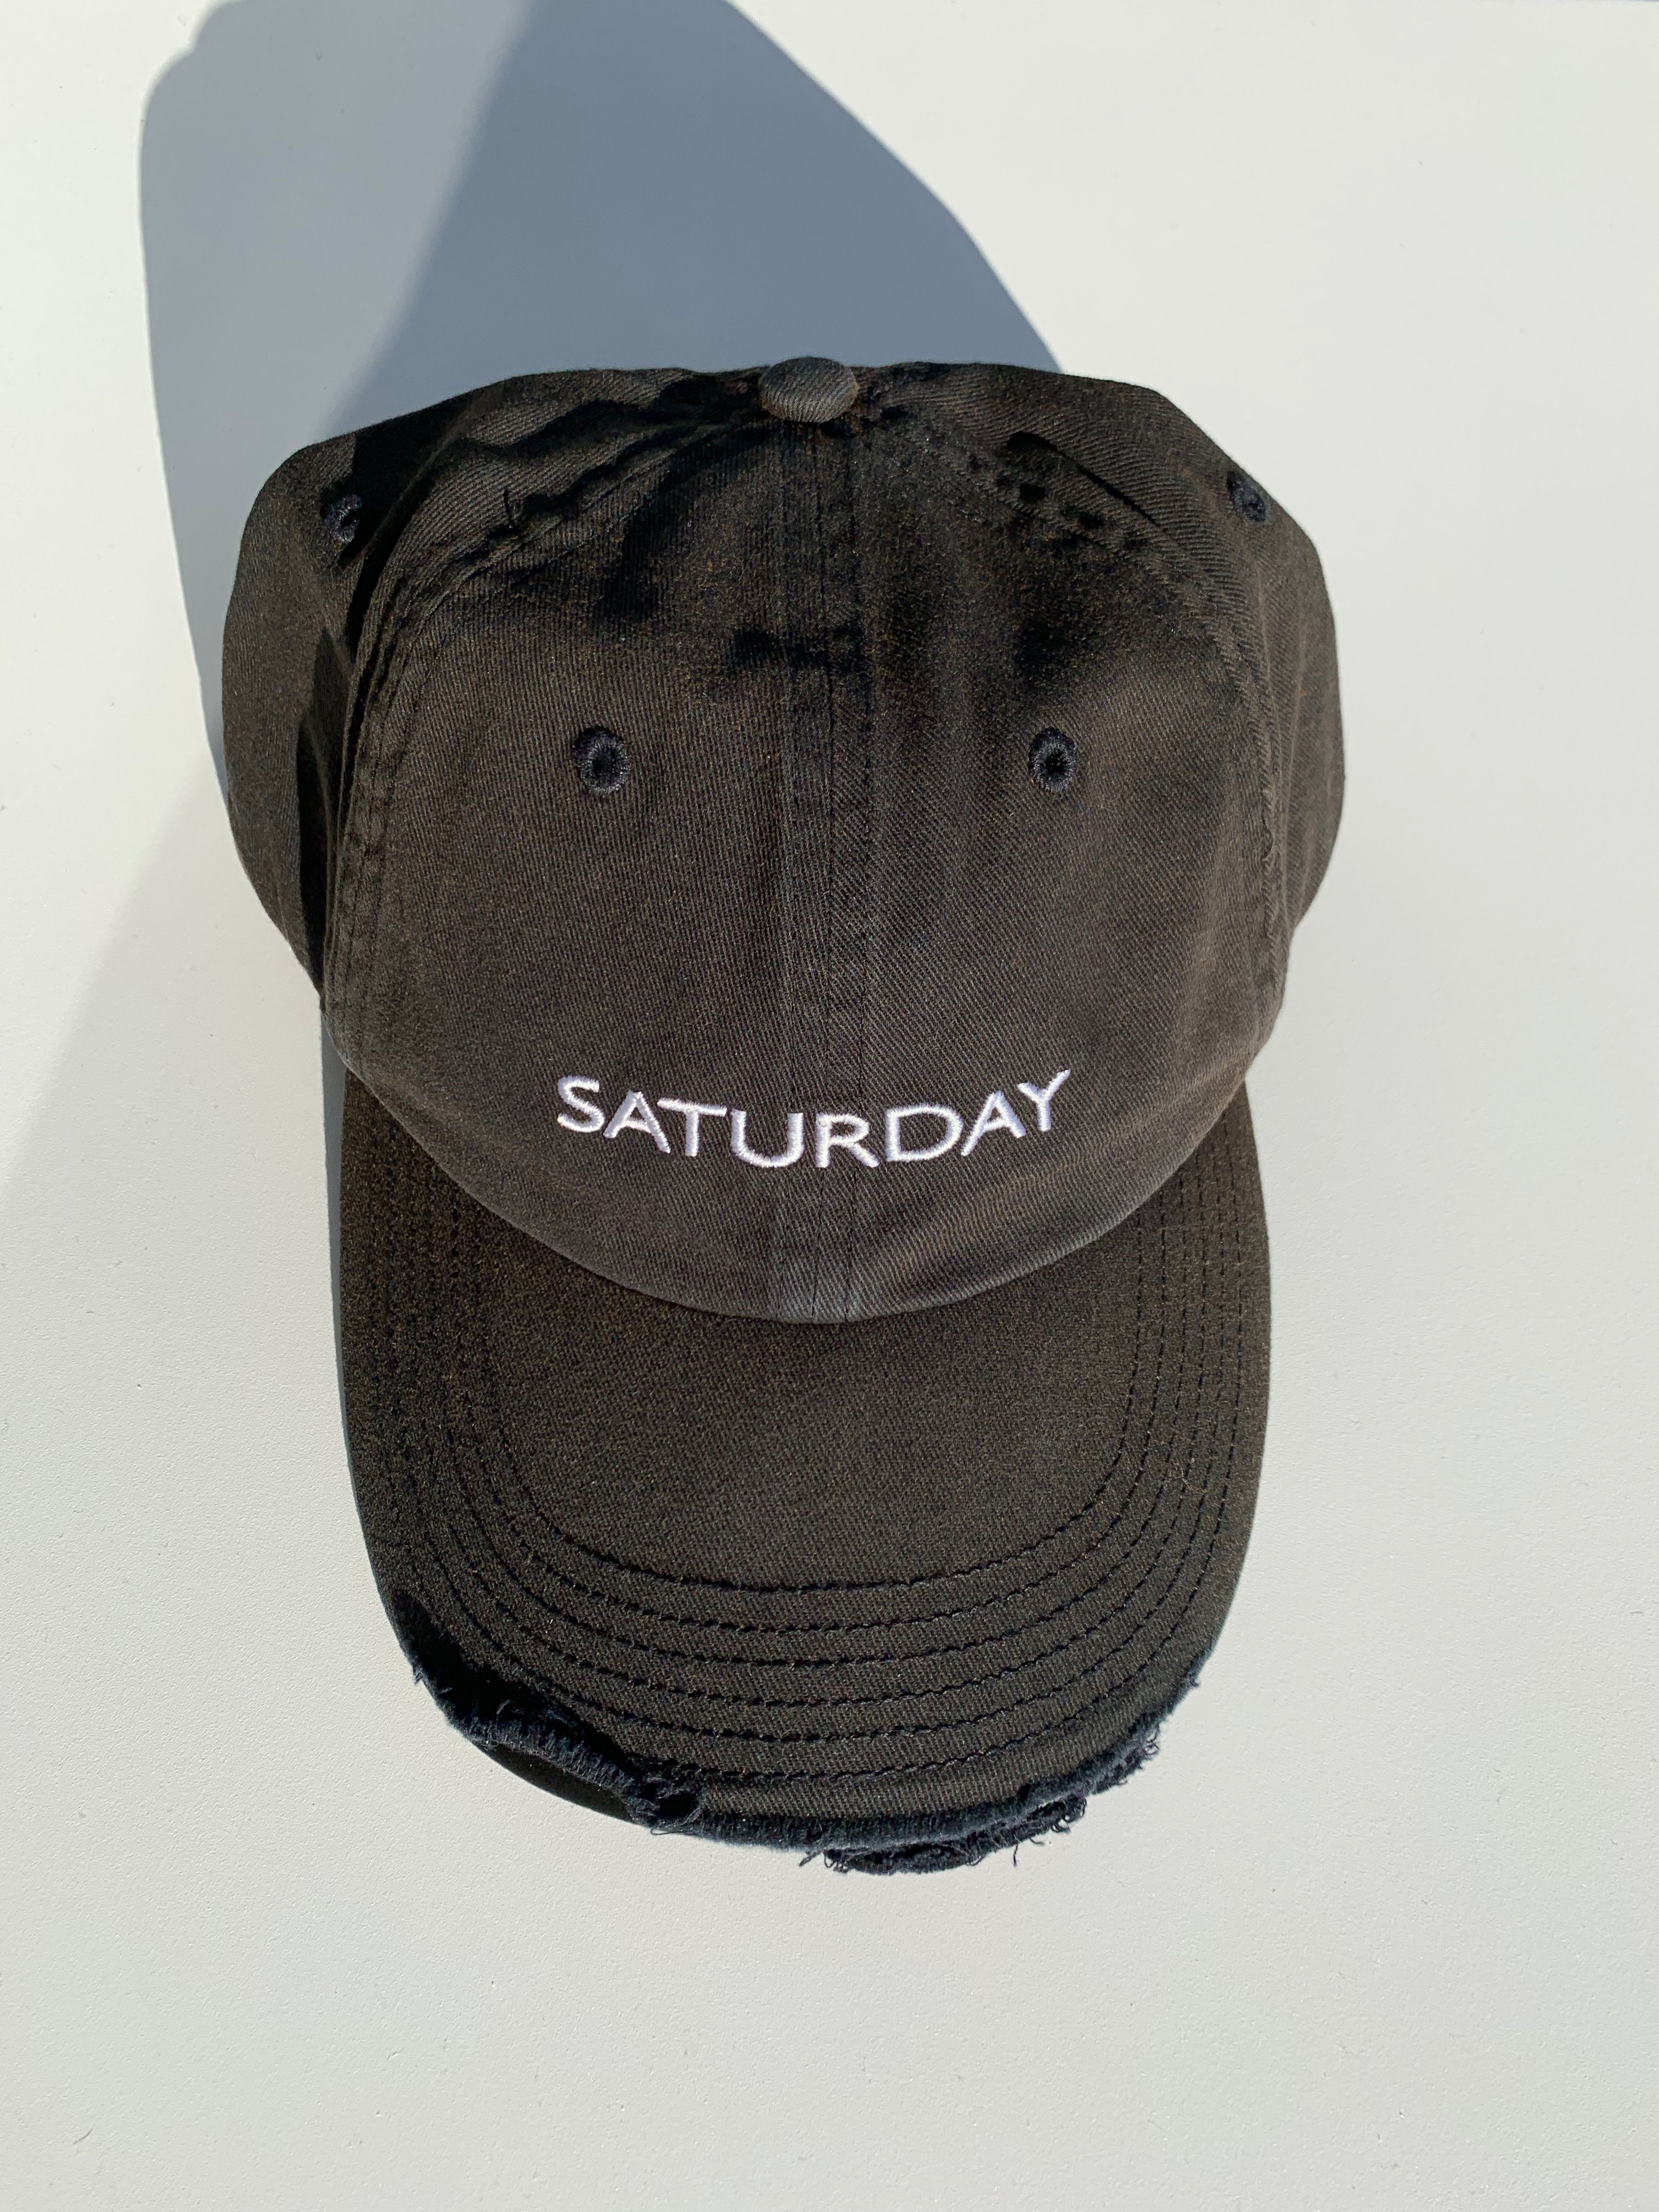 5754d89b2d73ea Vetements New. Black Reebok Edition 'saturday' Weekday Cap | Grailed